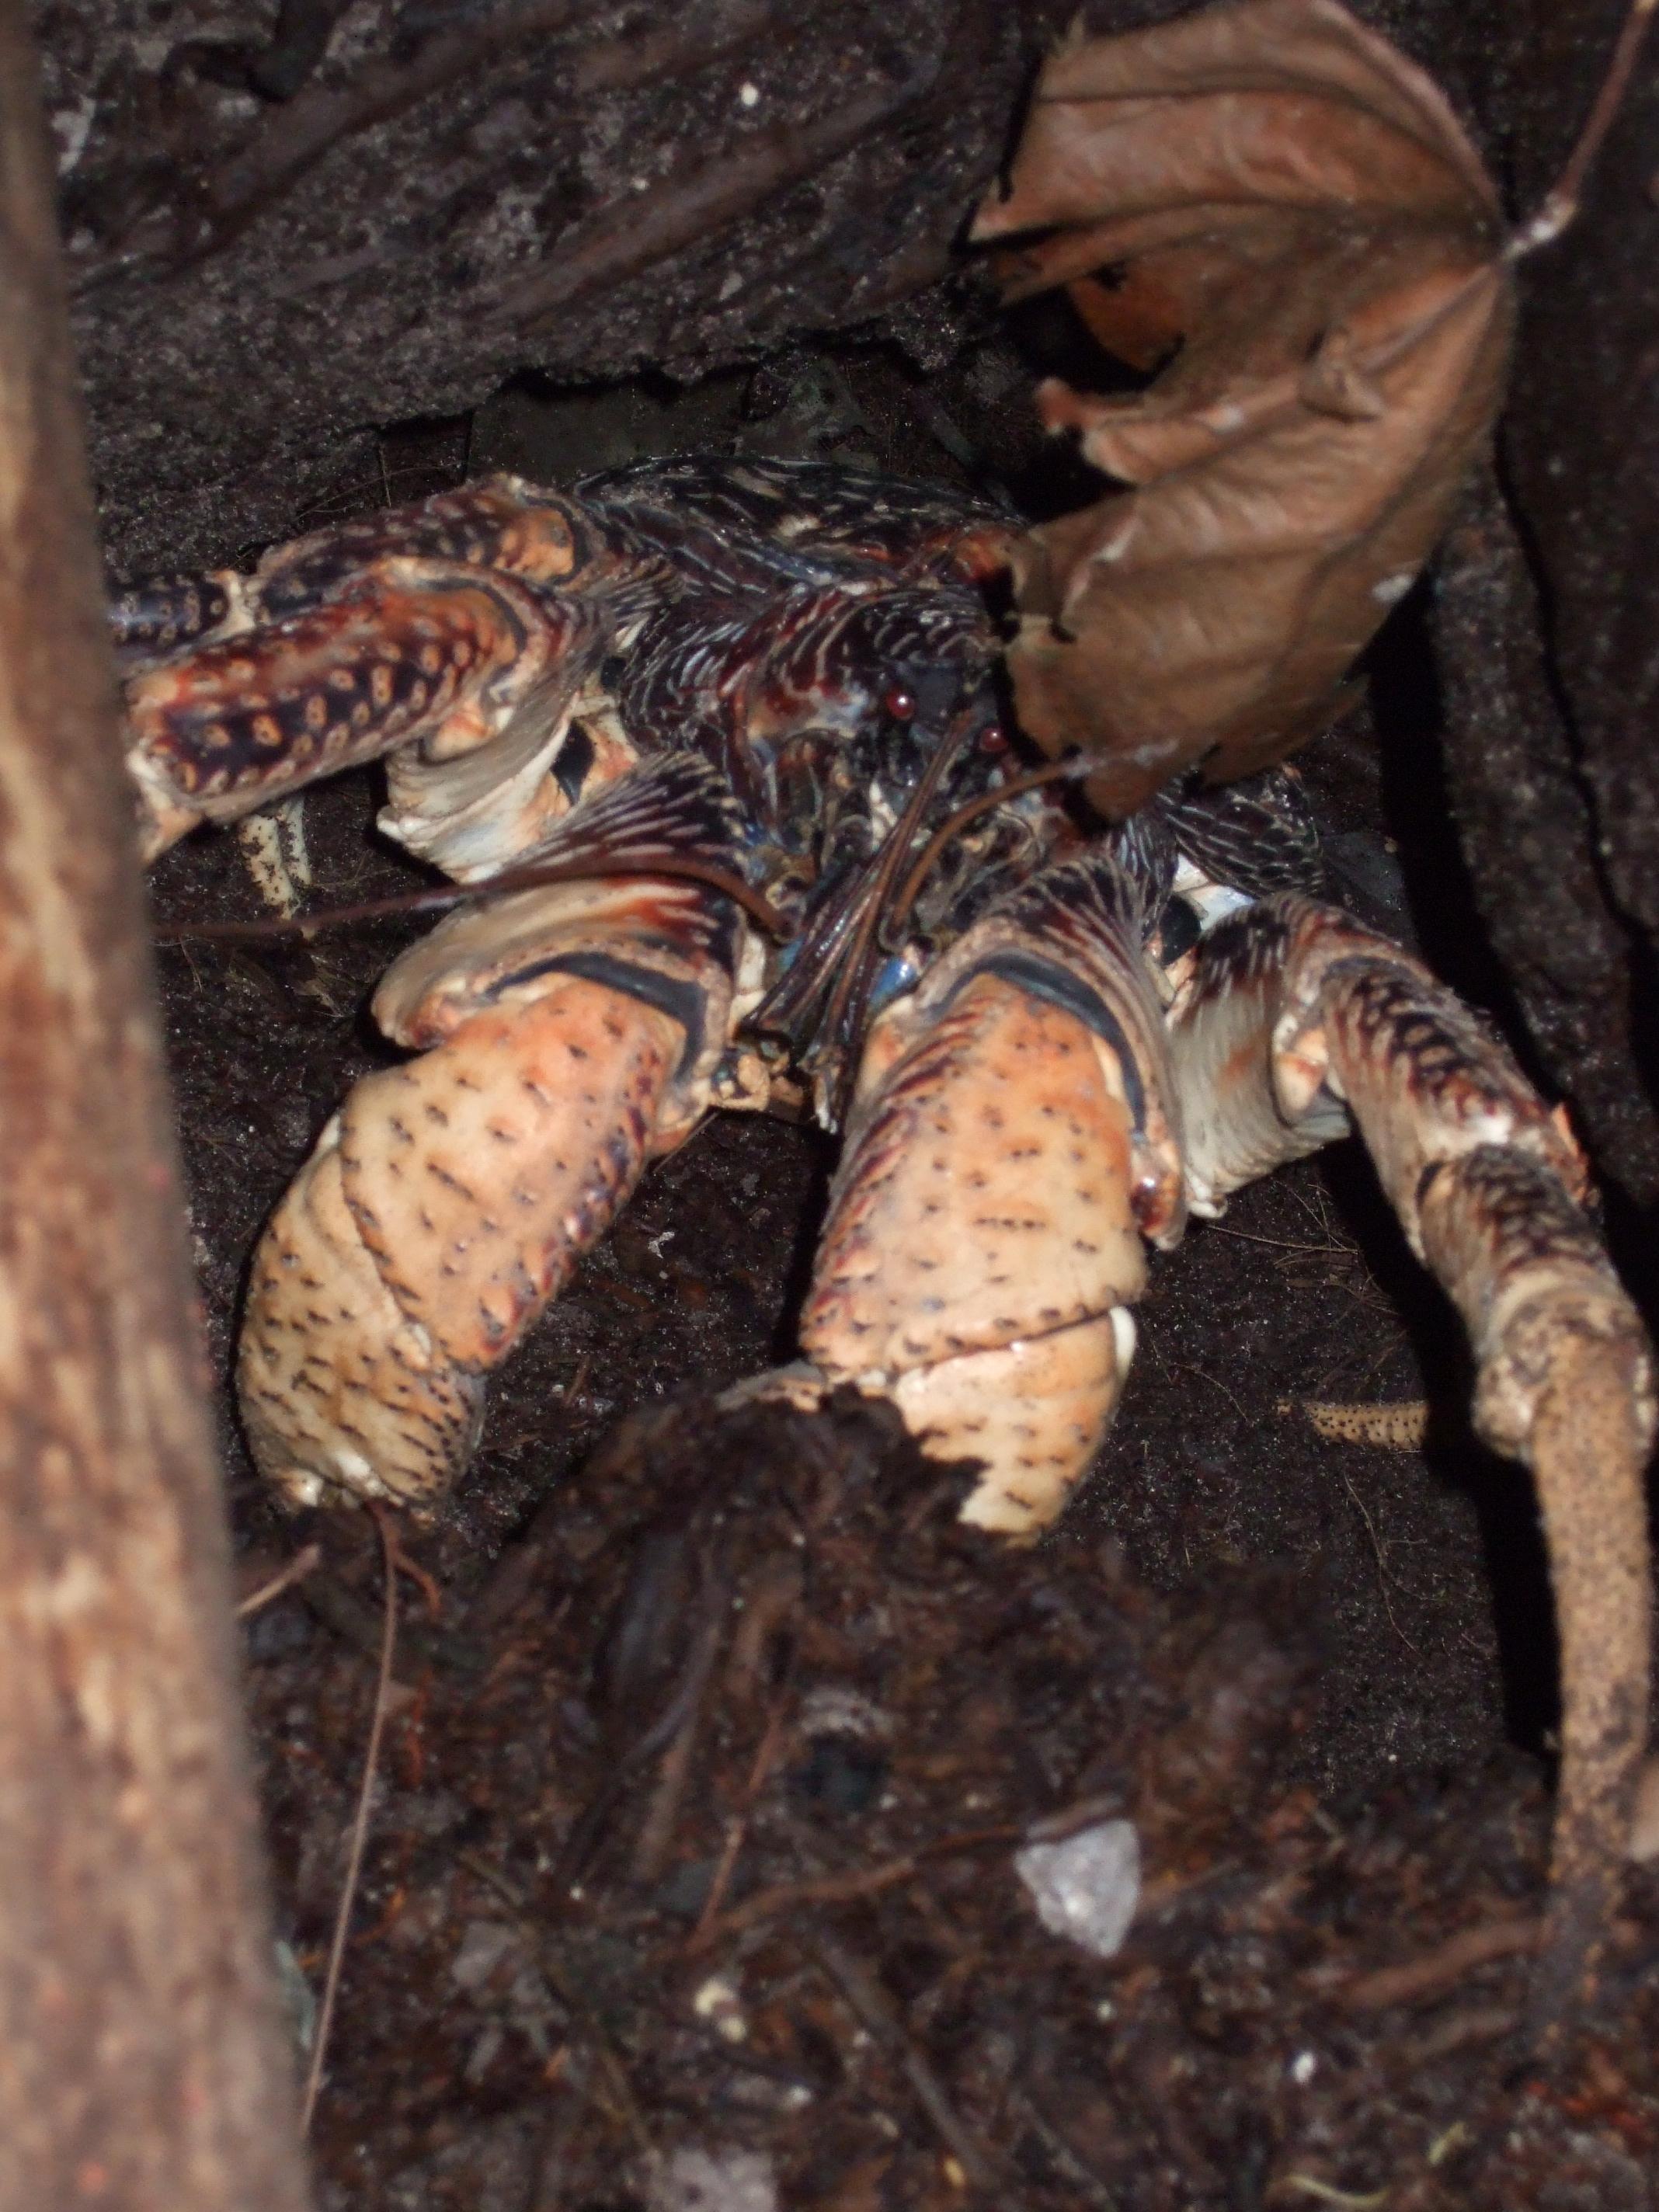 filebirgus latro in burrowjpg wikimedia commons